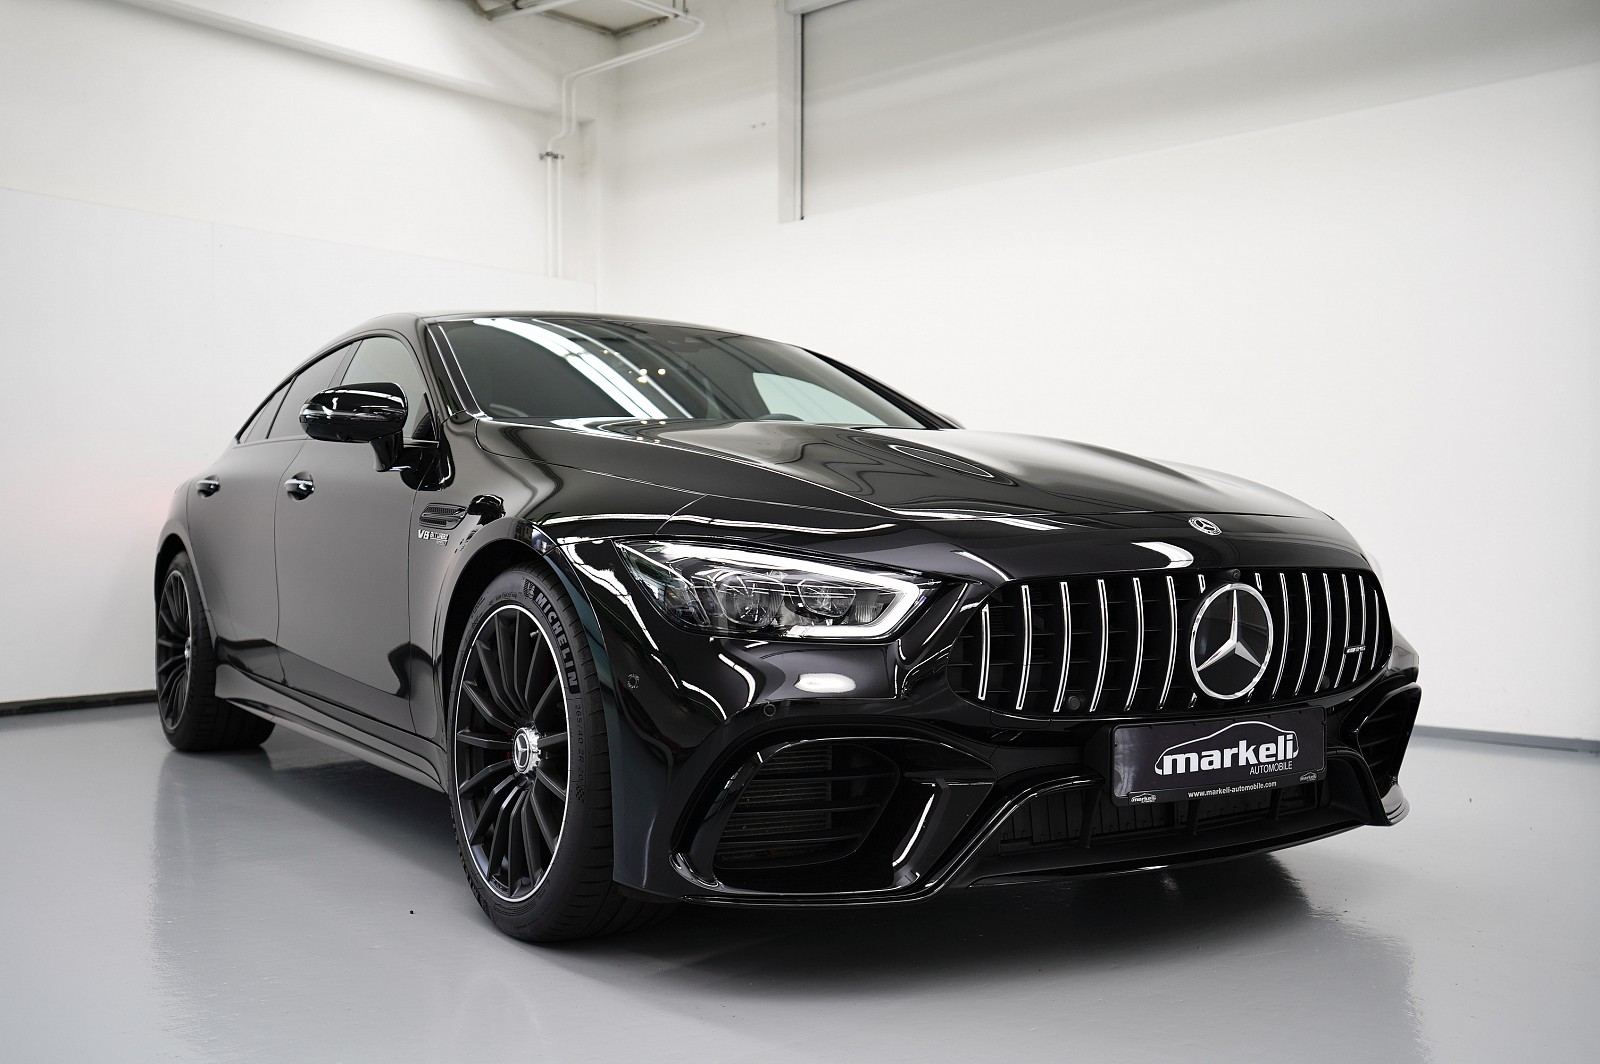 Mercedes-amg gt 63 4matic+ AMG NIGHT - PAKET + panoramadach + tv